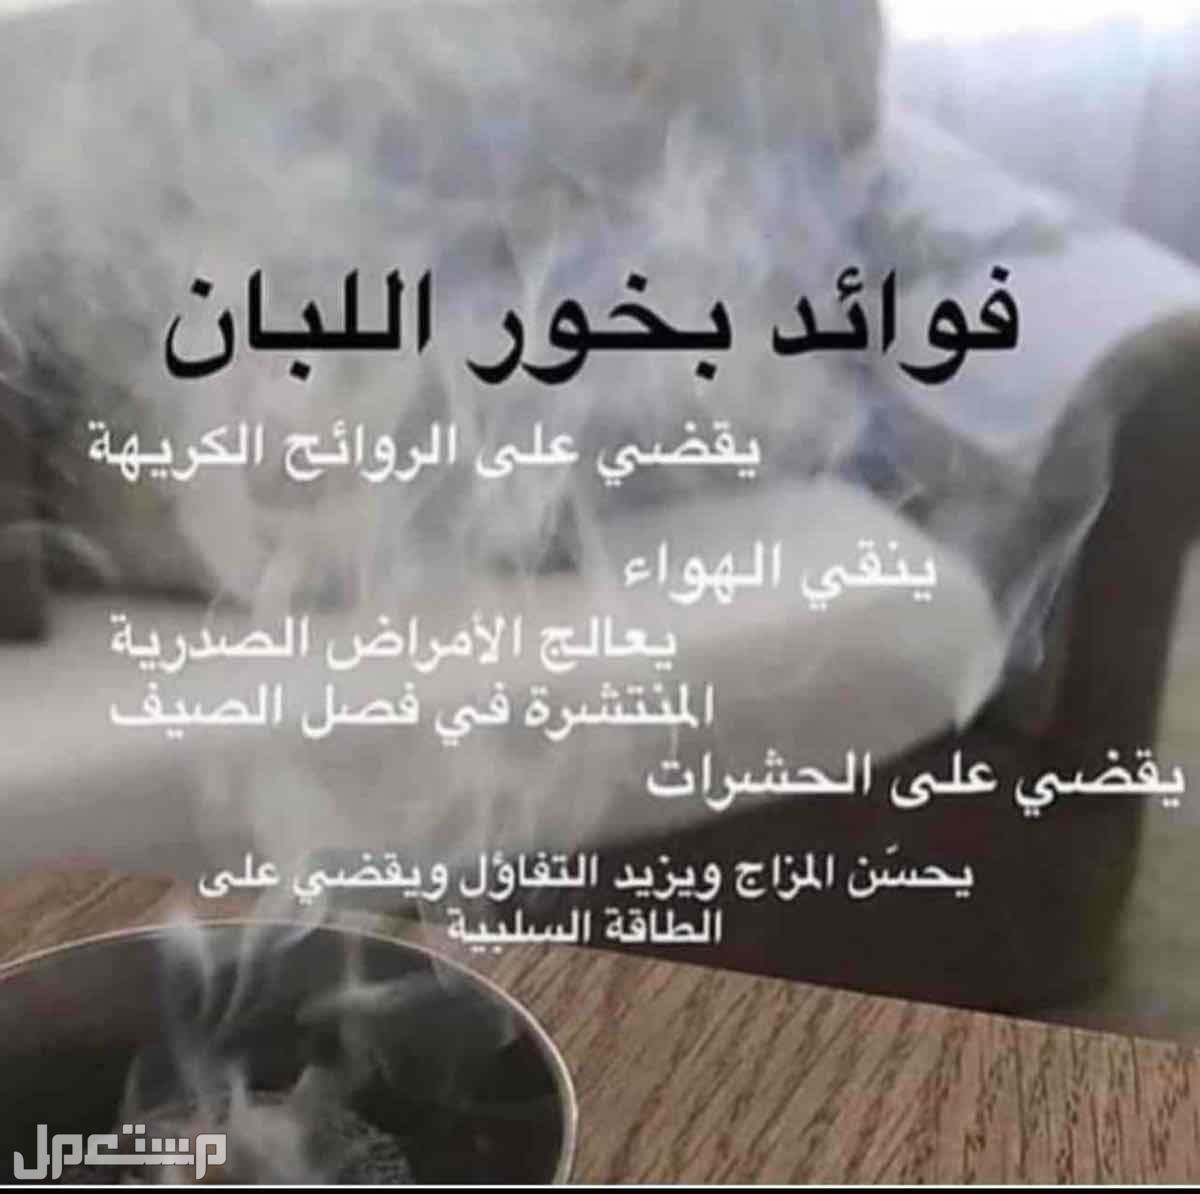 بخور لبان بروائح العطريه ب25